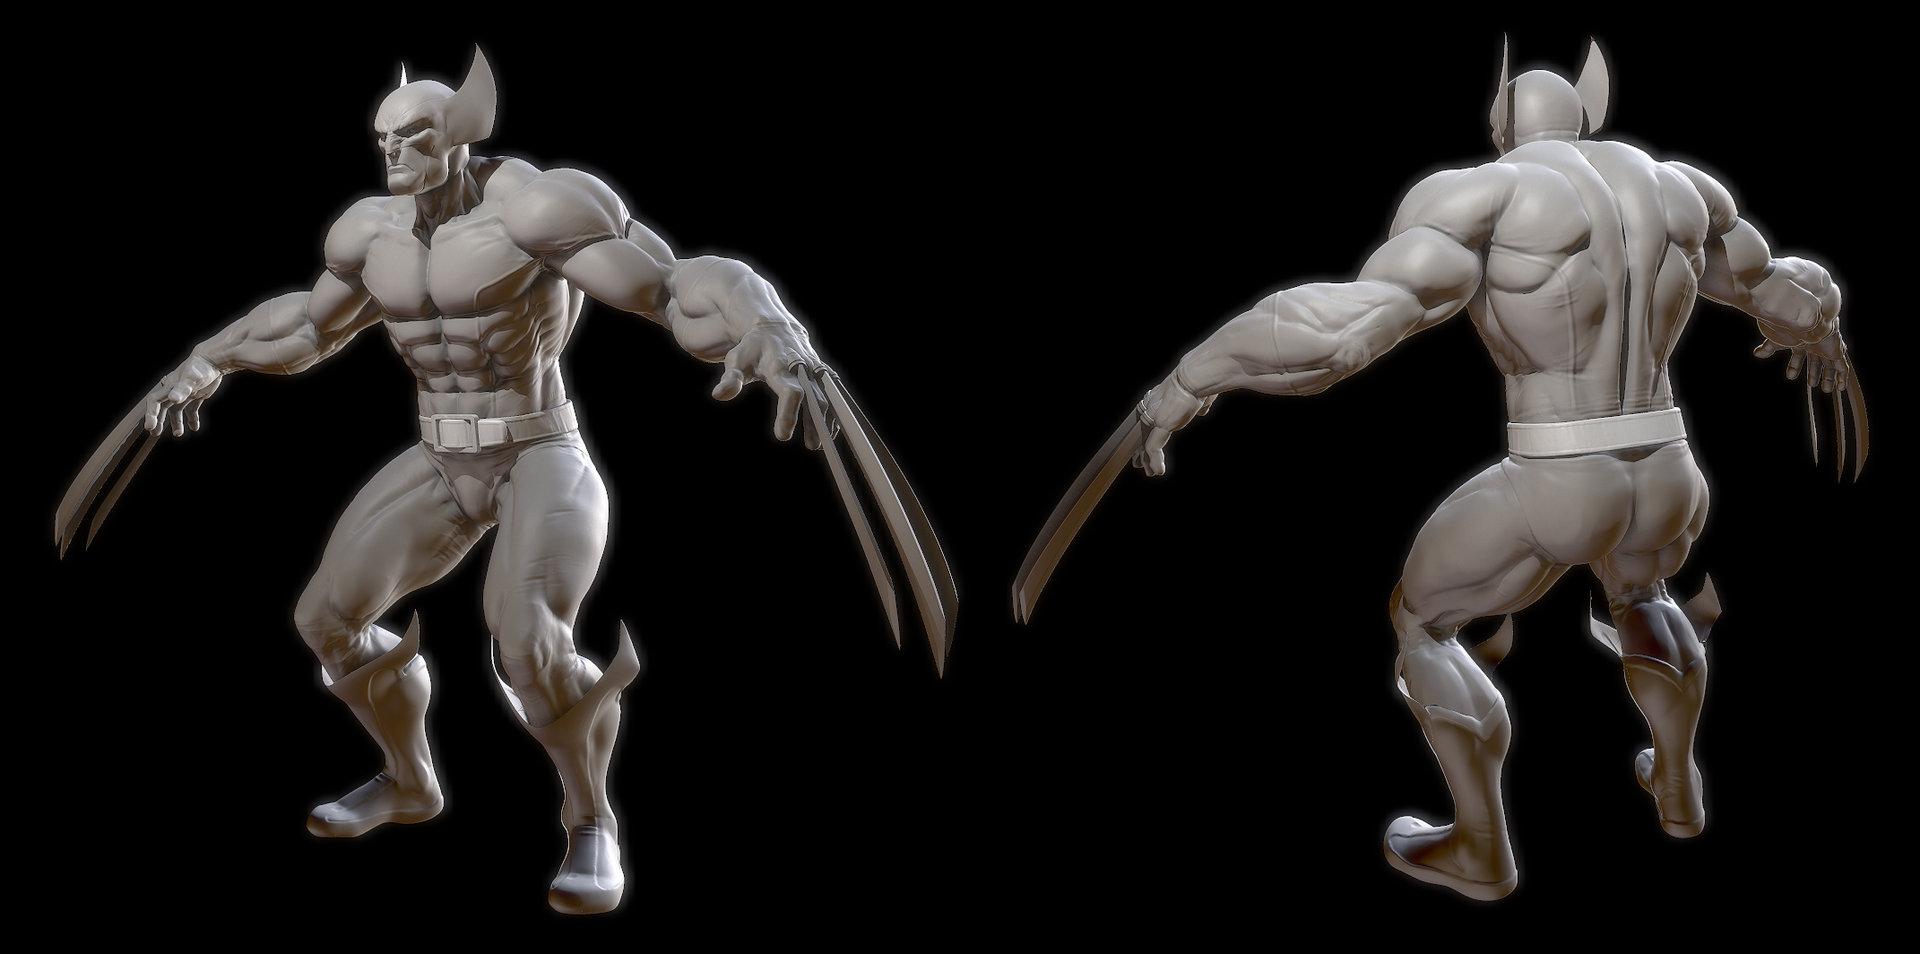 glenn-donaldson-wolverine-sculpt-final2.jpg?1434320062